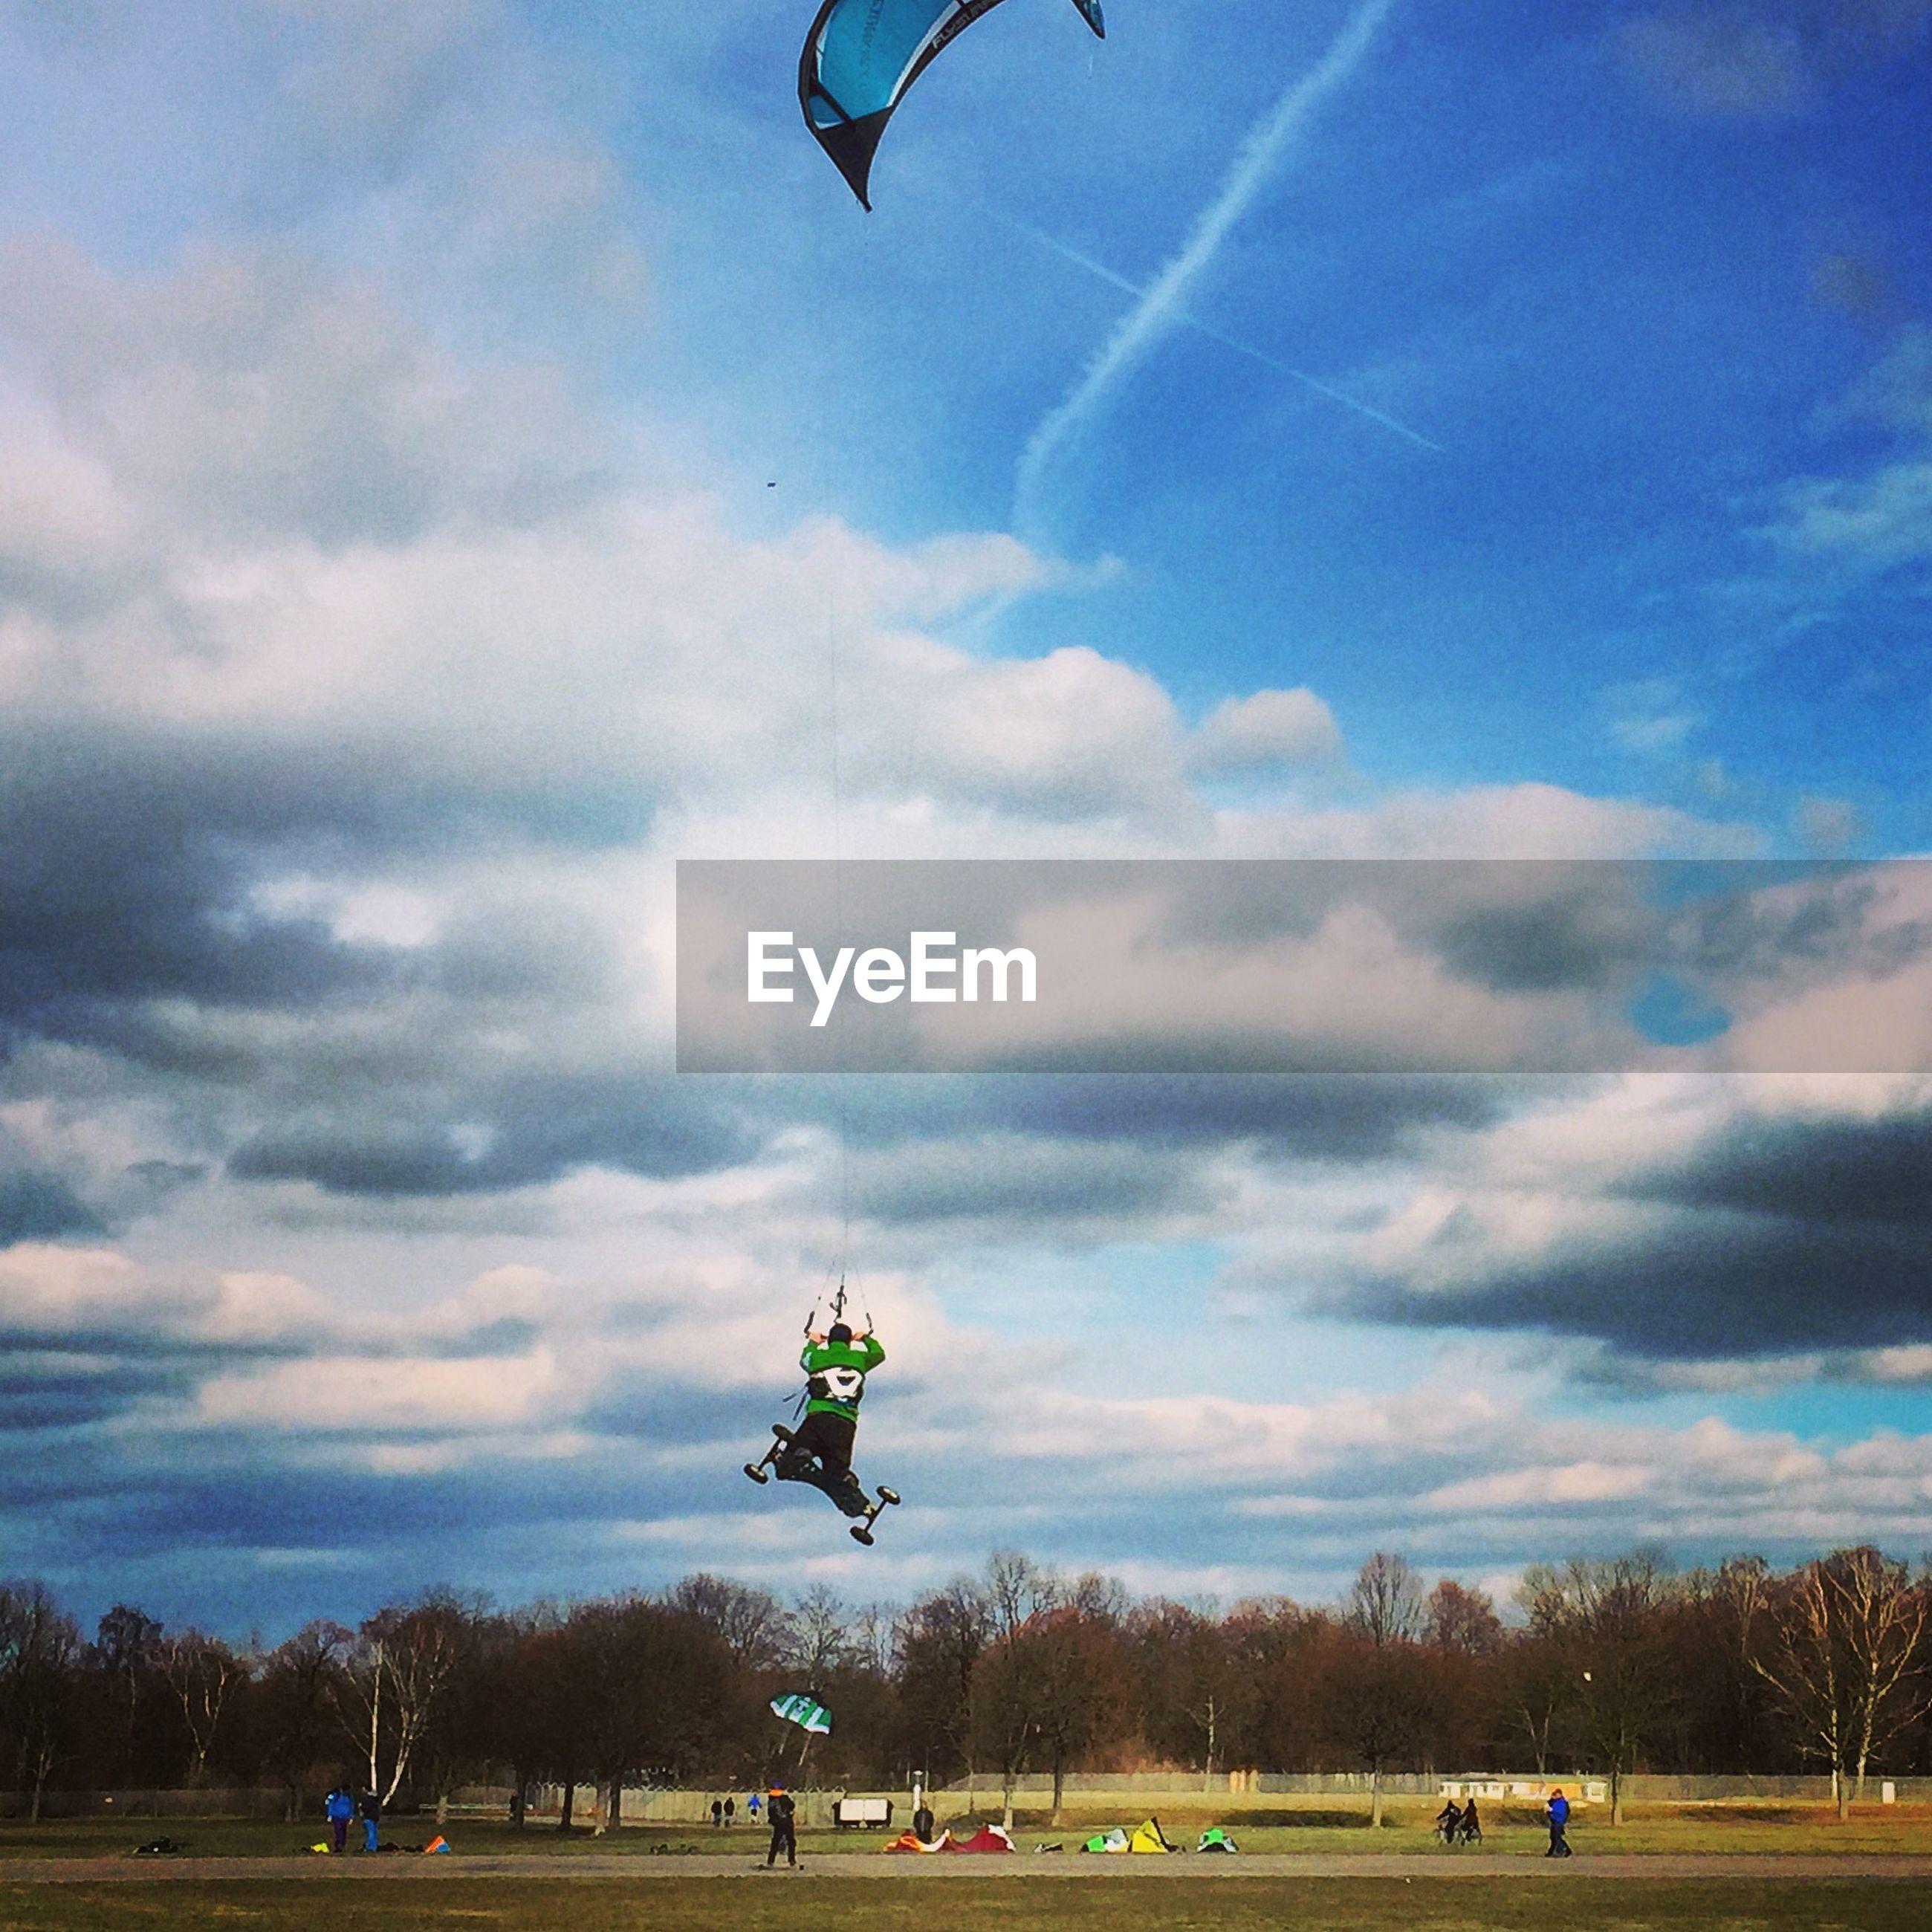 Man with skateboard flying kite